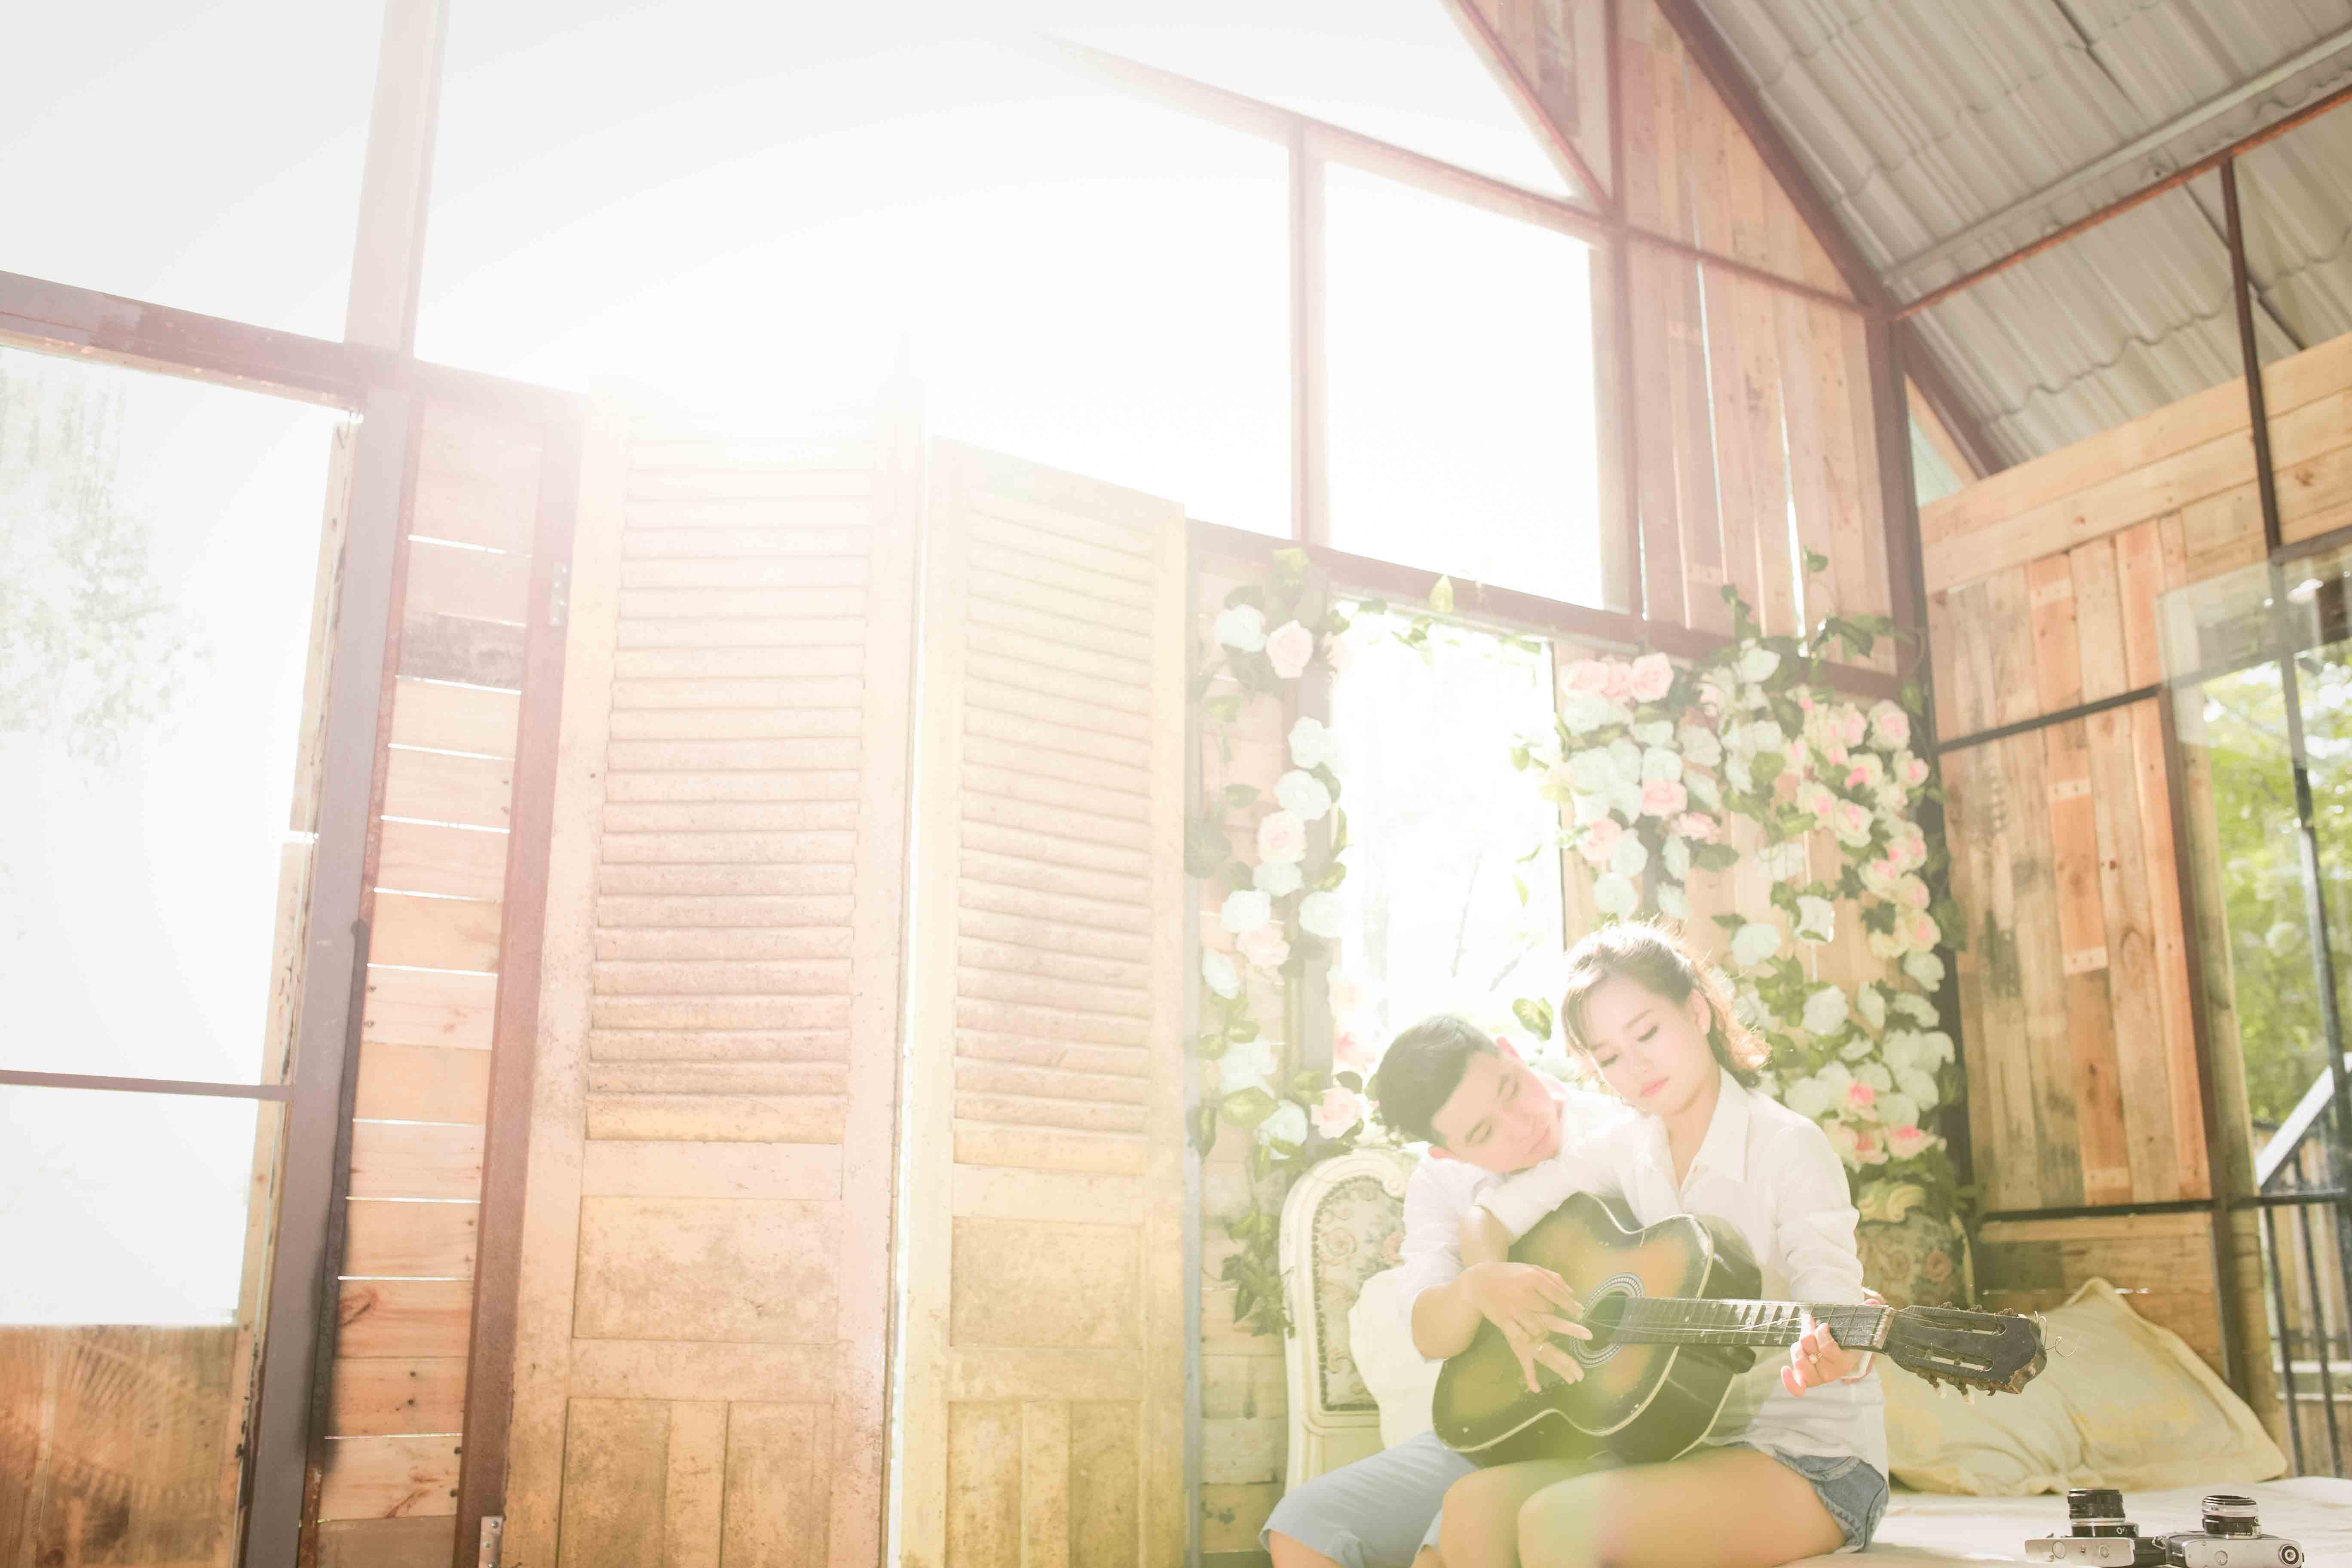 alohastudio-wedding-dia-chi-studio-chup-hinh-cuoi-dep-tai-tp-hcm-4